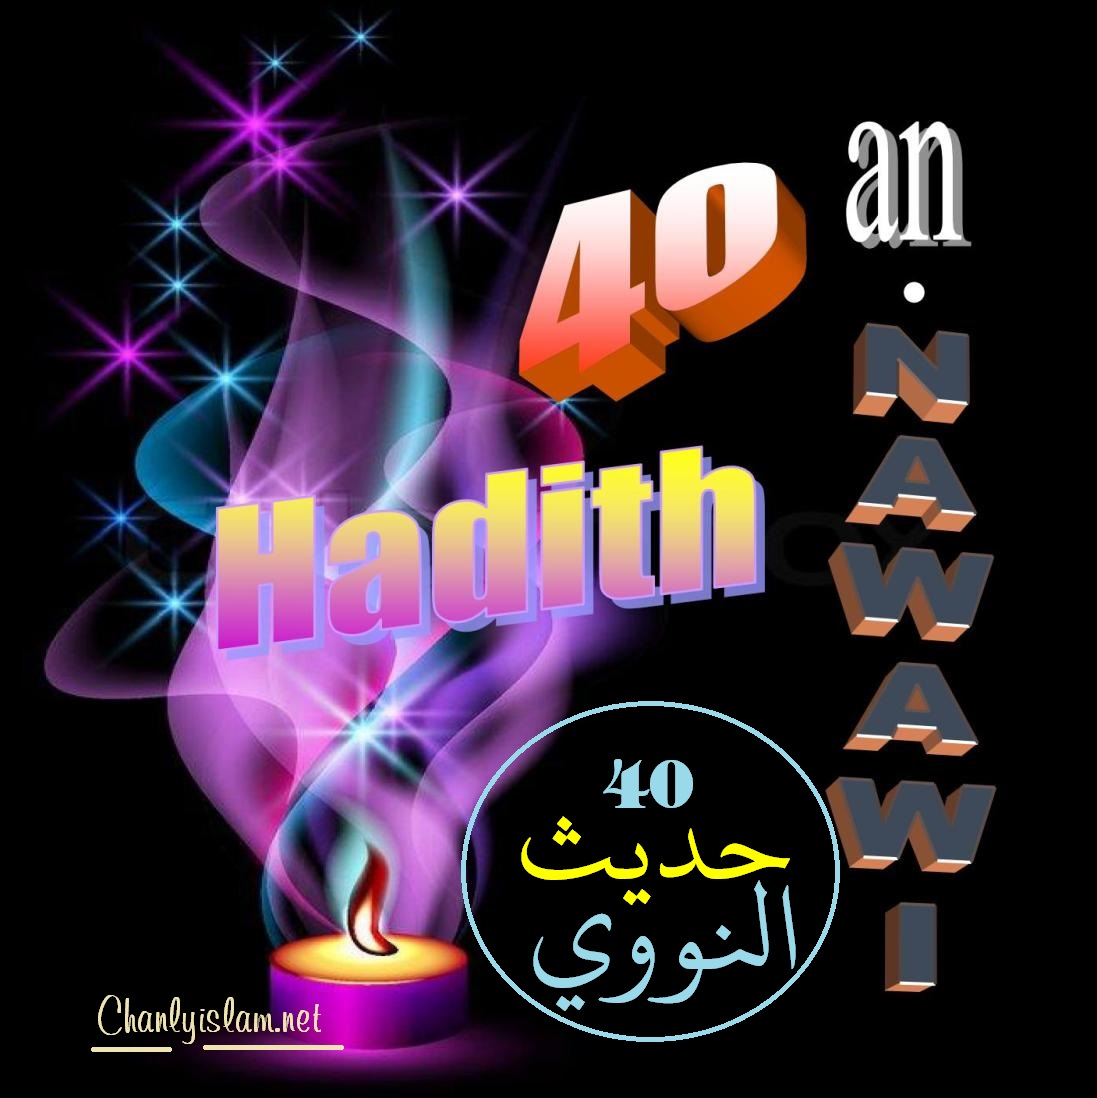 40 HADITH AL NAWAWIS